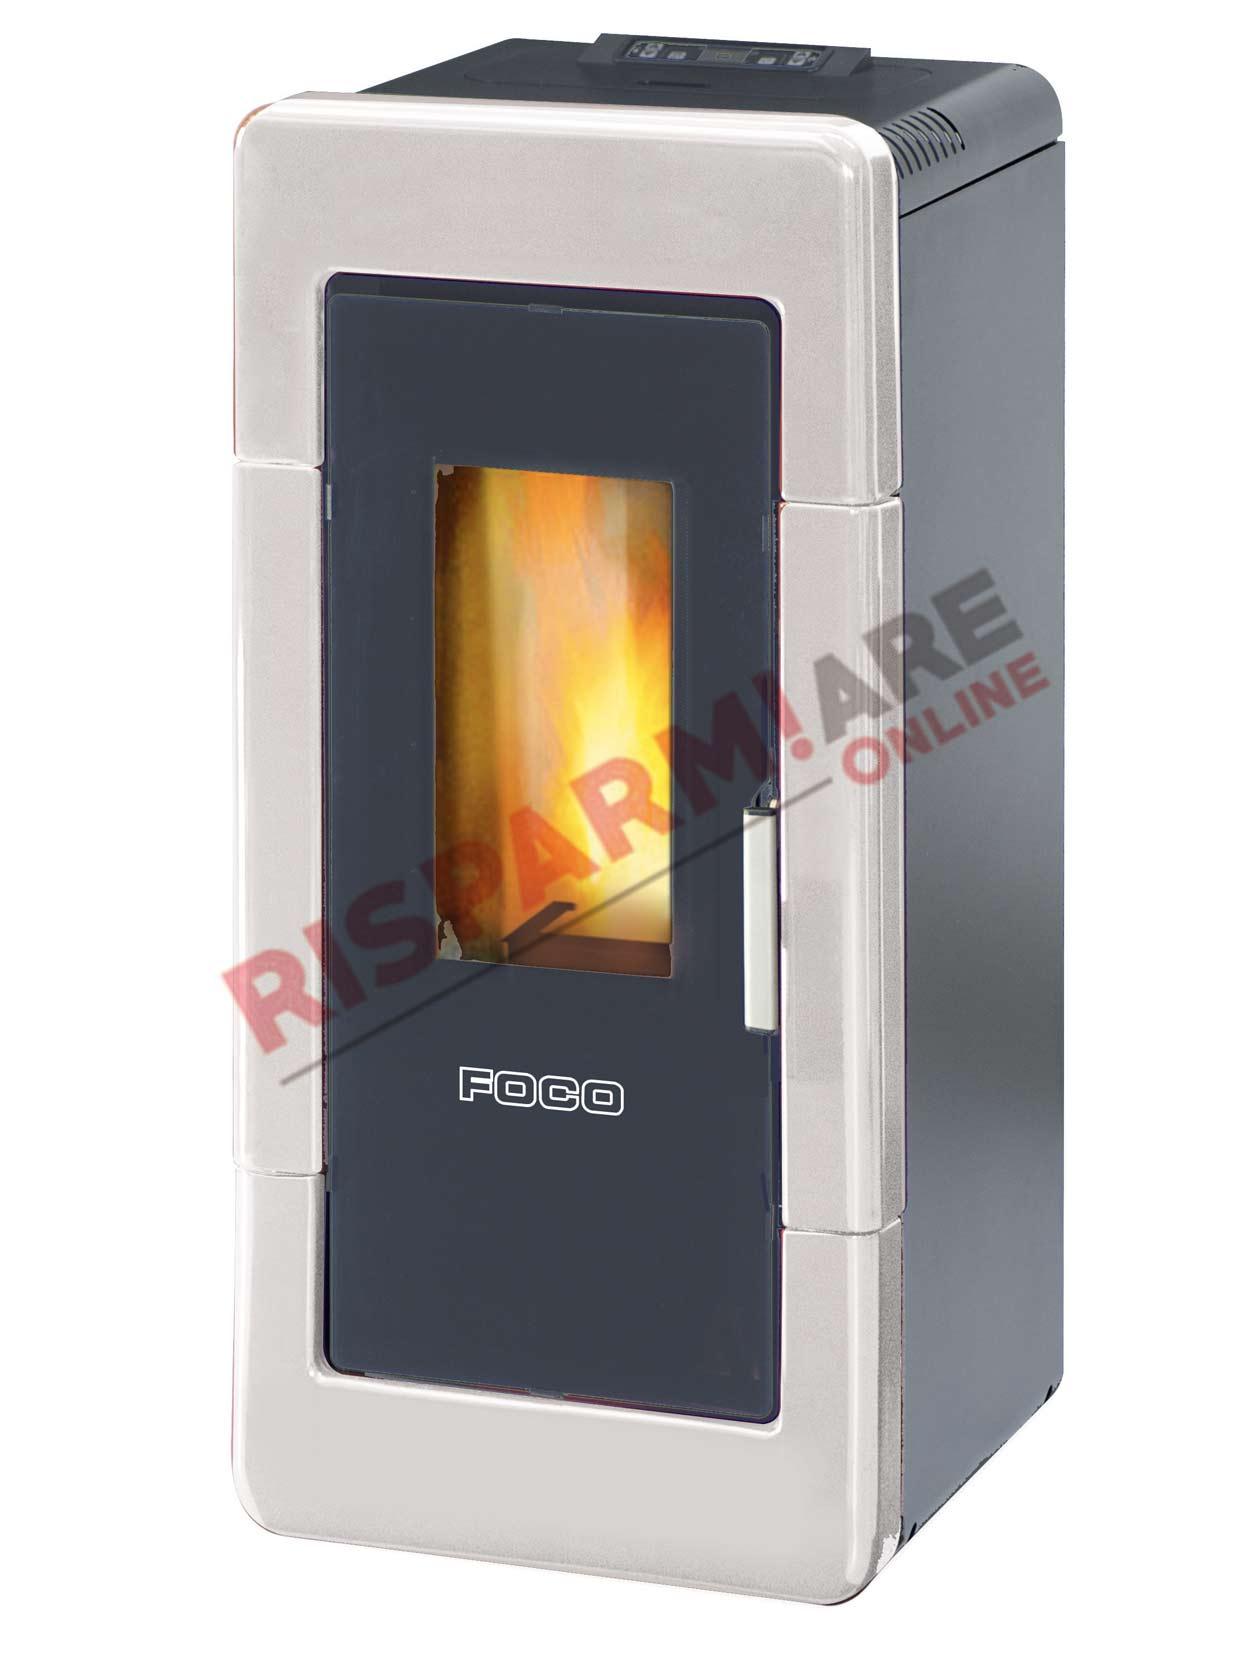 Foco termostufa a pellet traditional majolica idro 14 14 for Foco stufe pellet